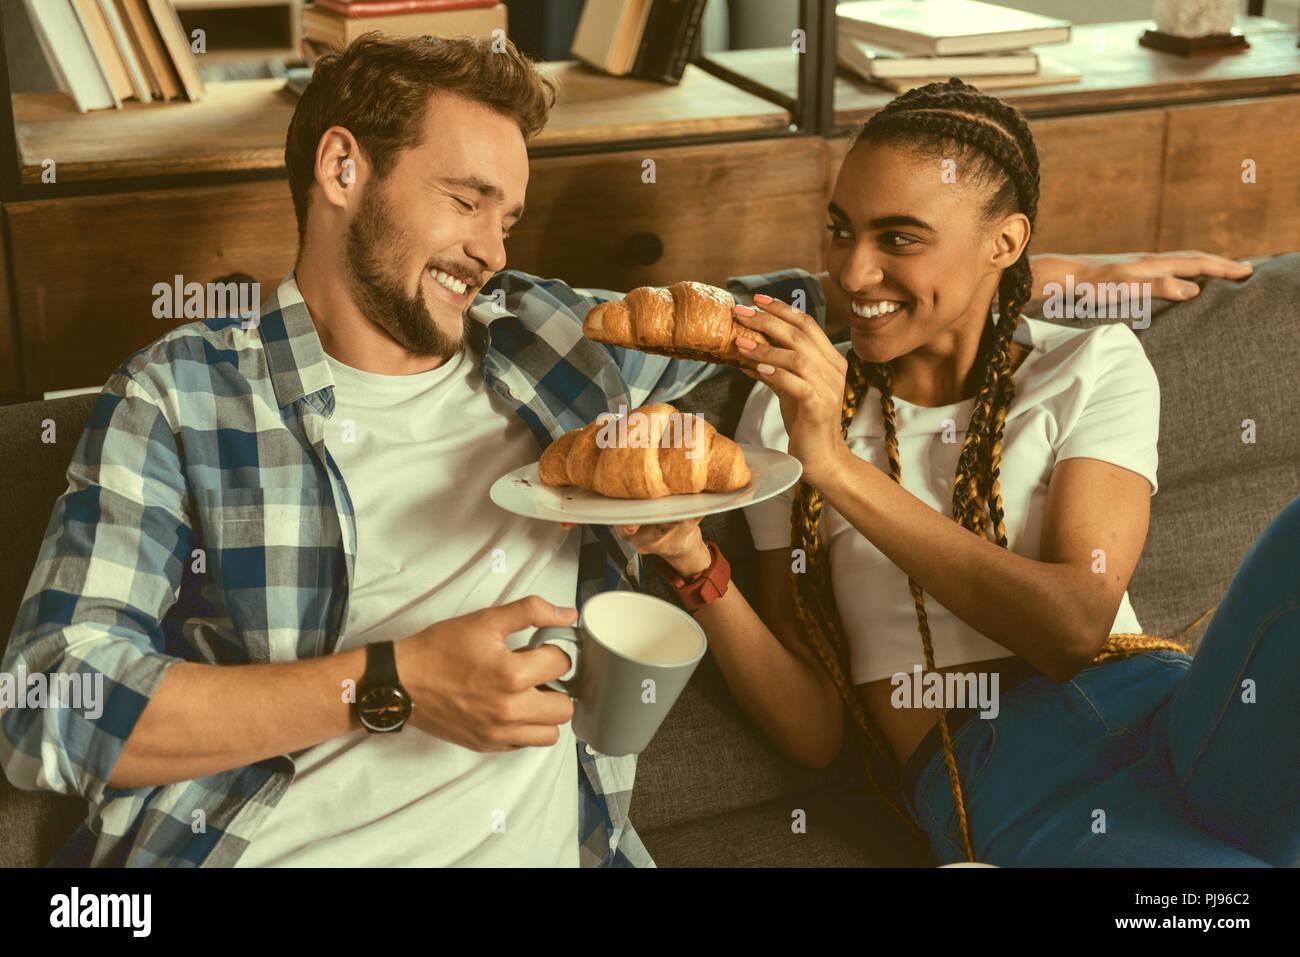 Loving girl treating boyfriend to croissant - Stock Image